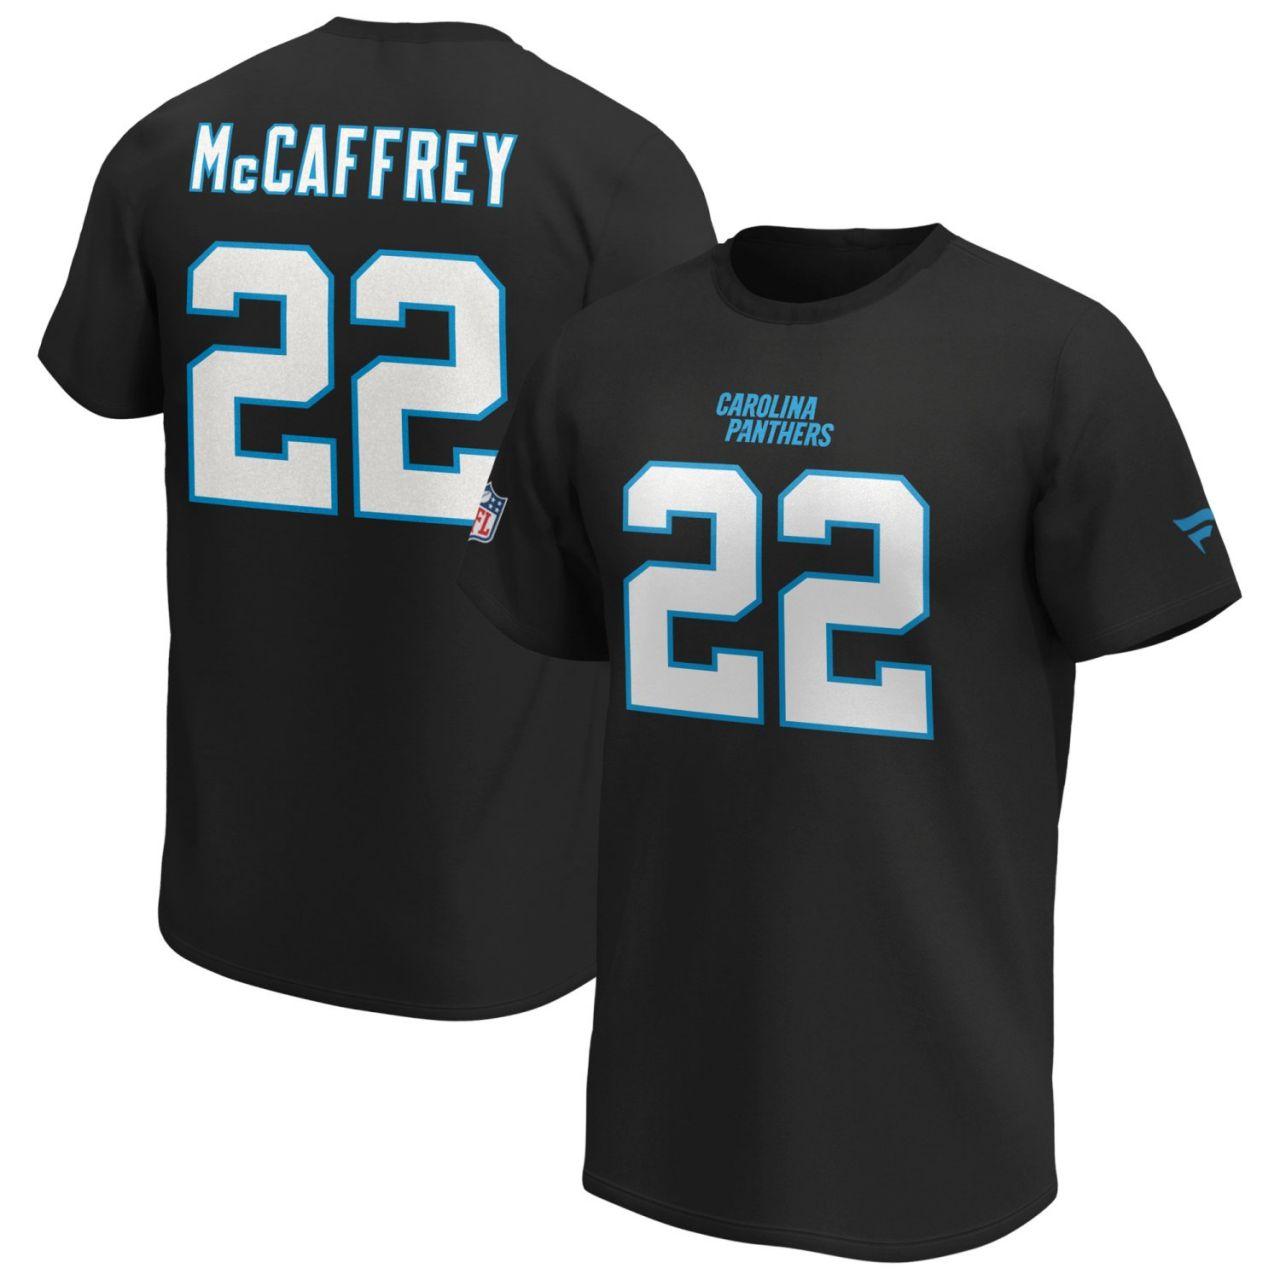 amfoo - Carolina Panthers NFL Shirt #22 Christian McCaffrey